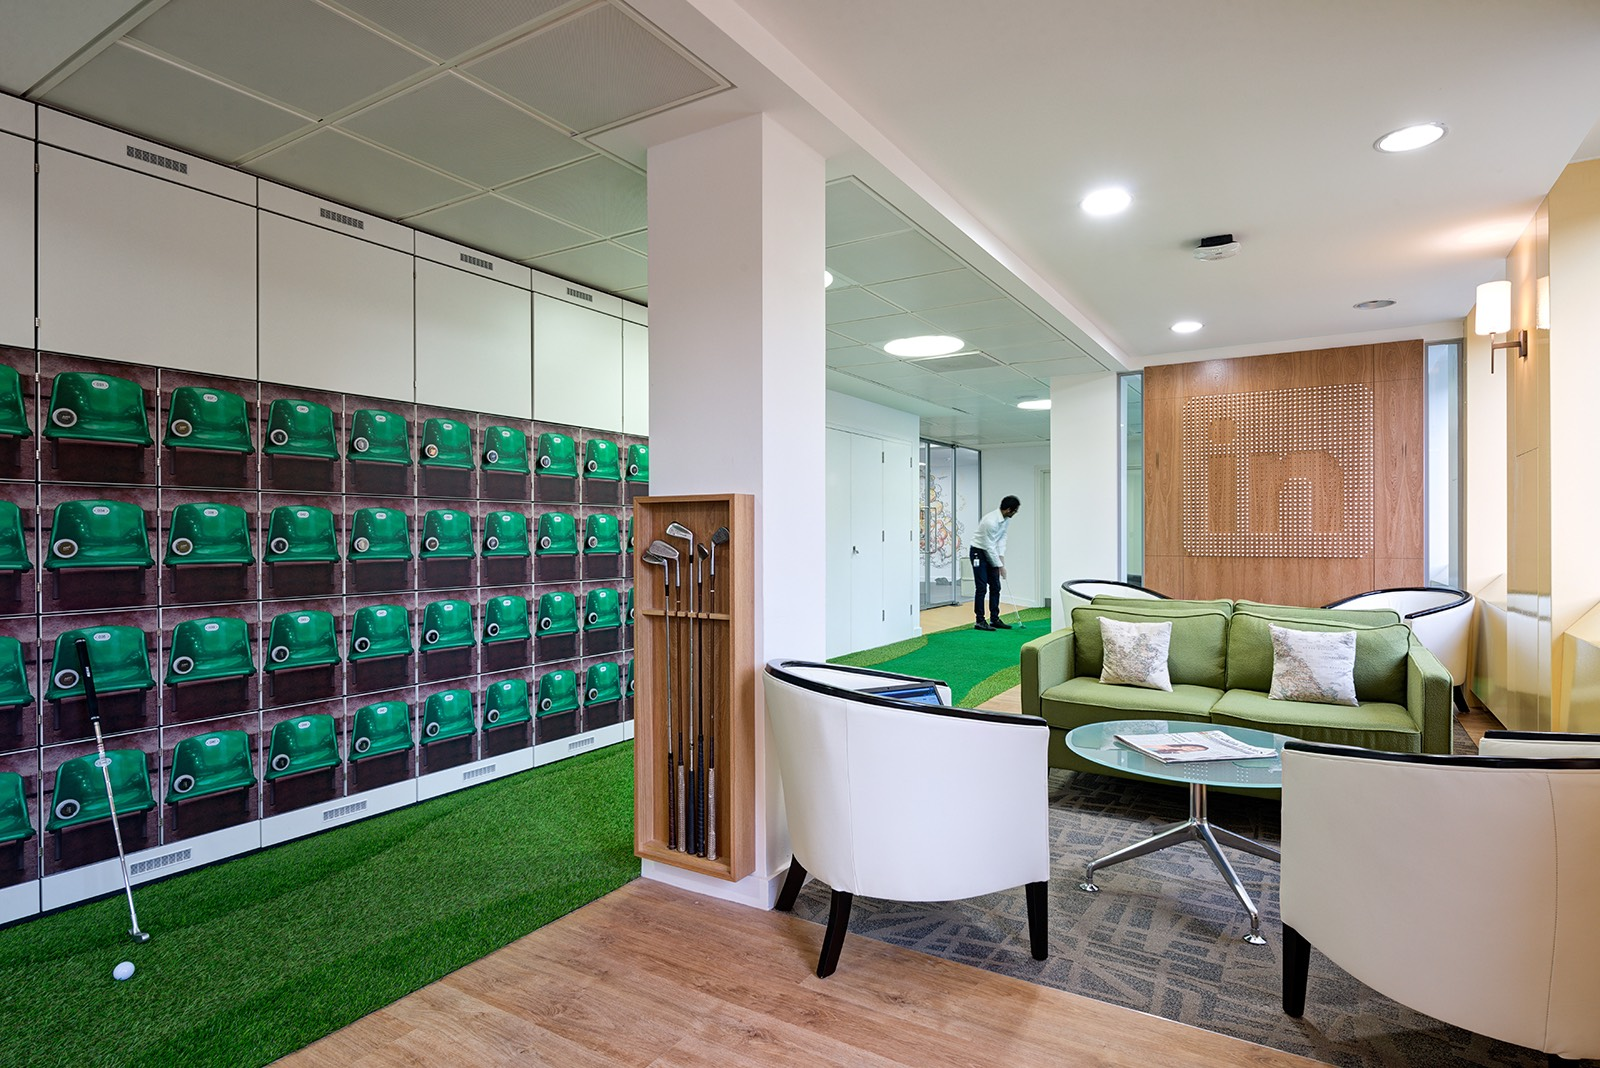 linkedin-office-london-10